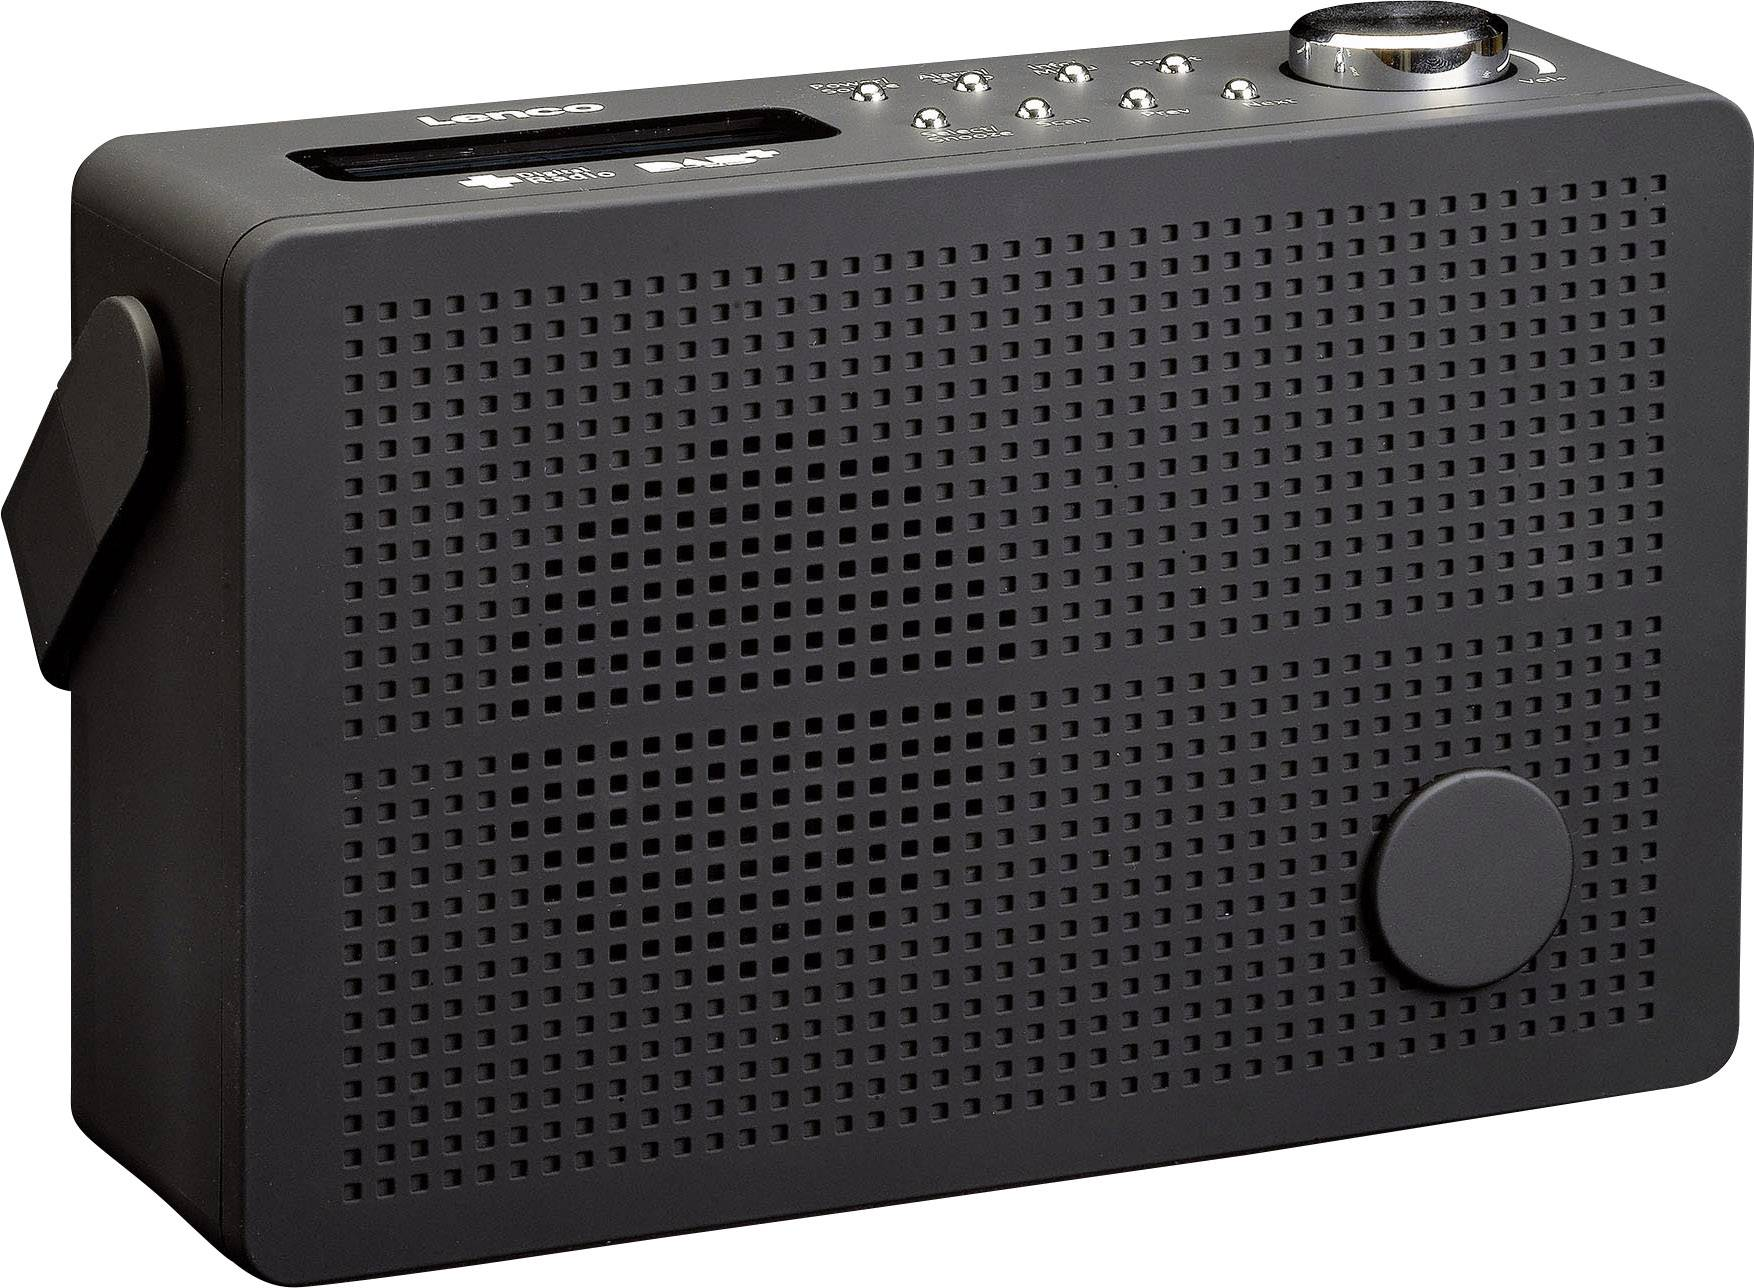 DAB+ stolní rádio Lenco PDR-030, FM, DAB+, černá